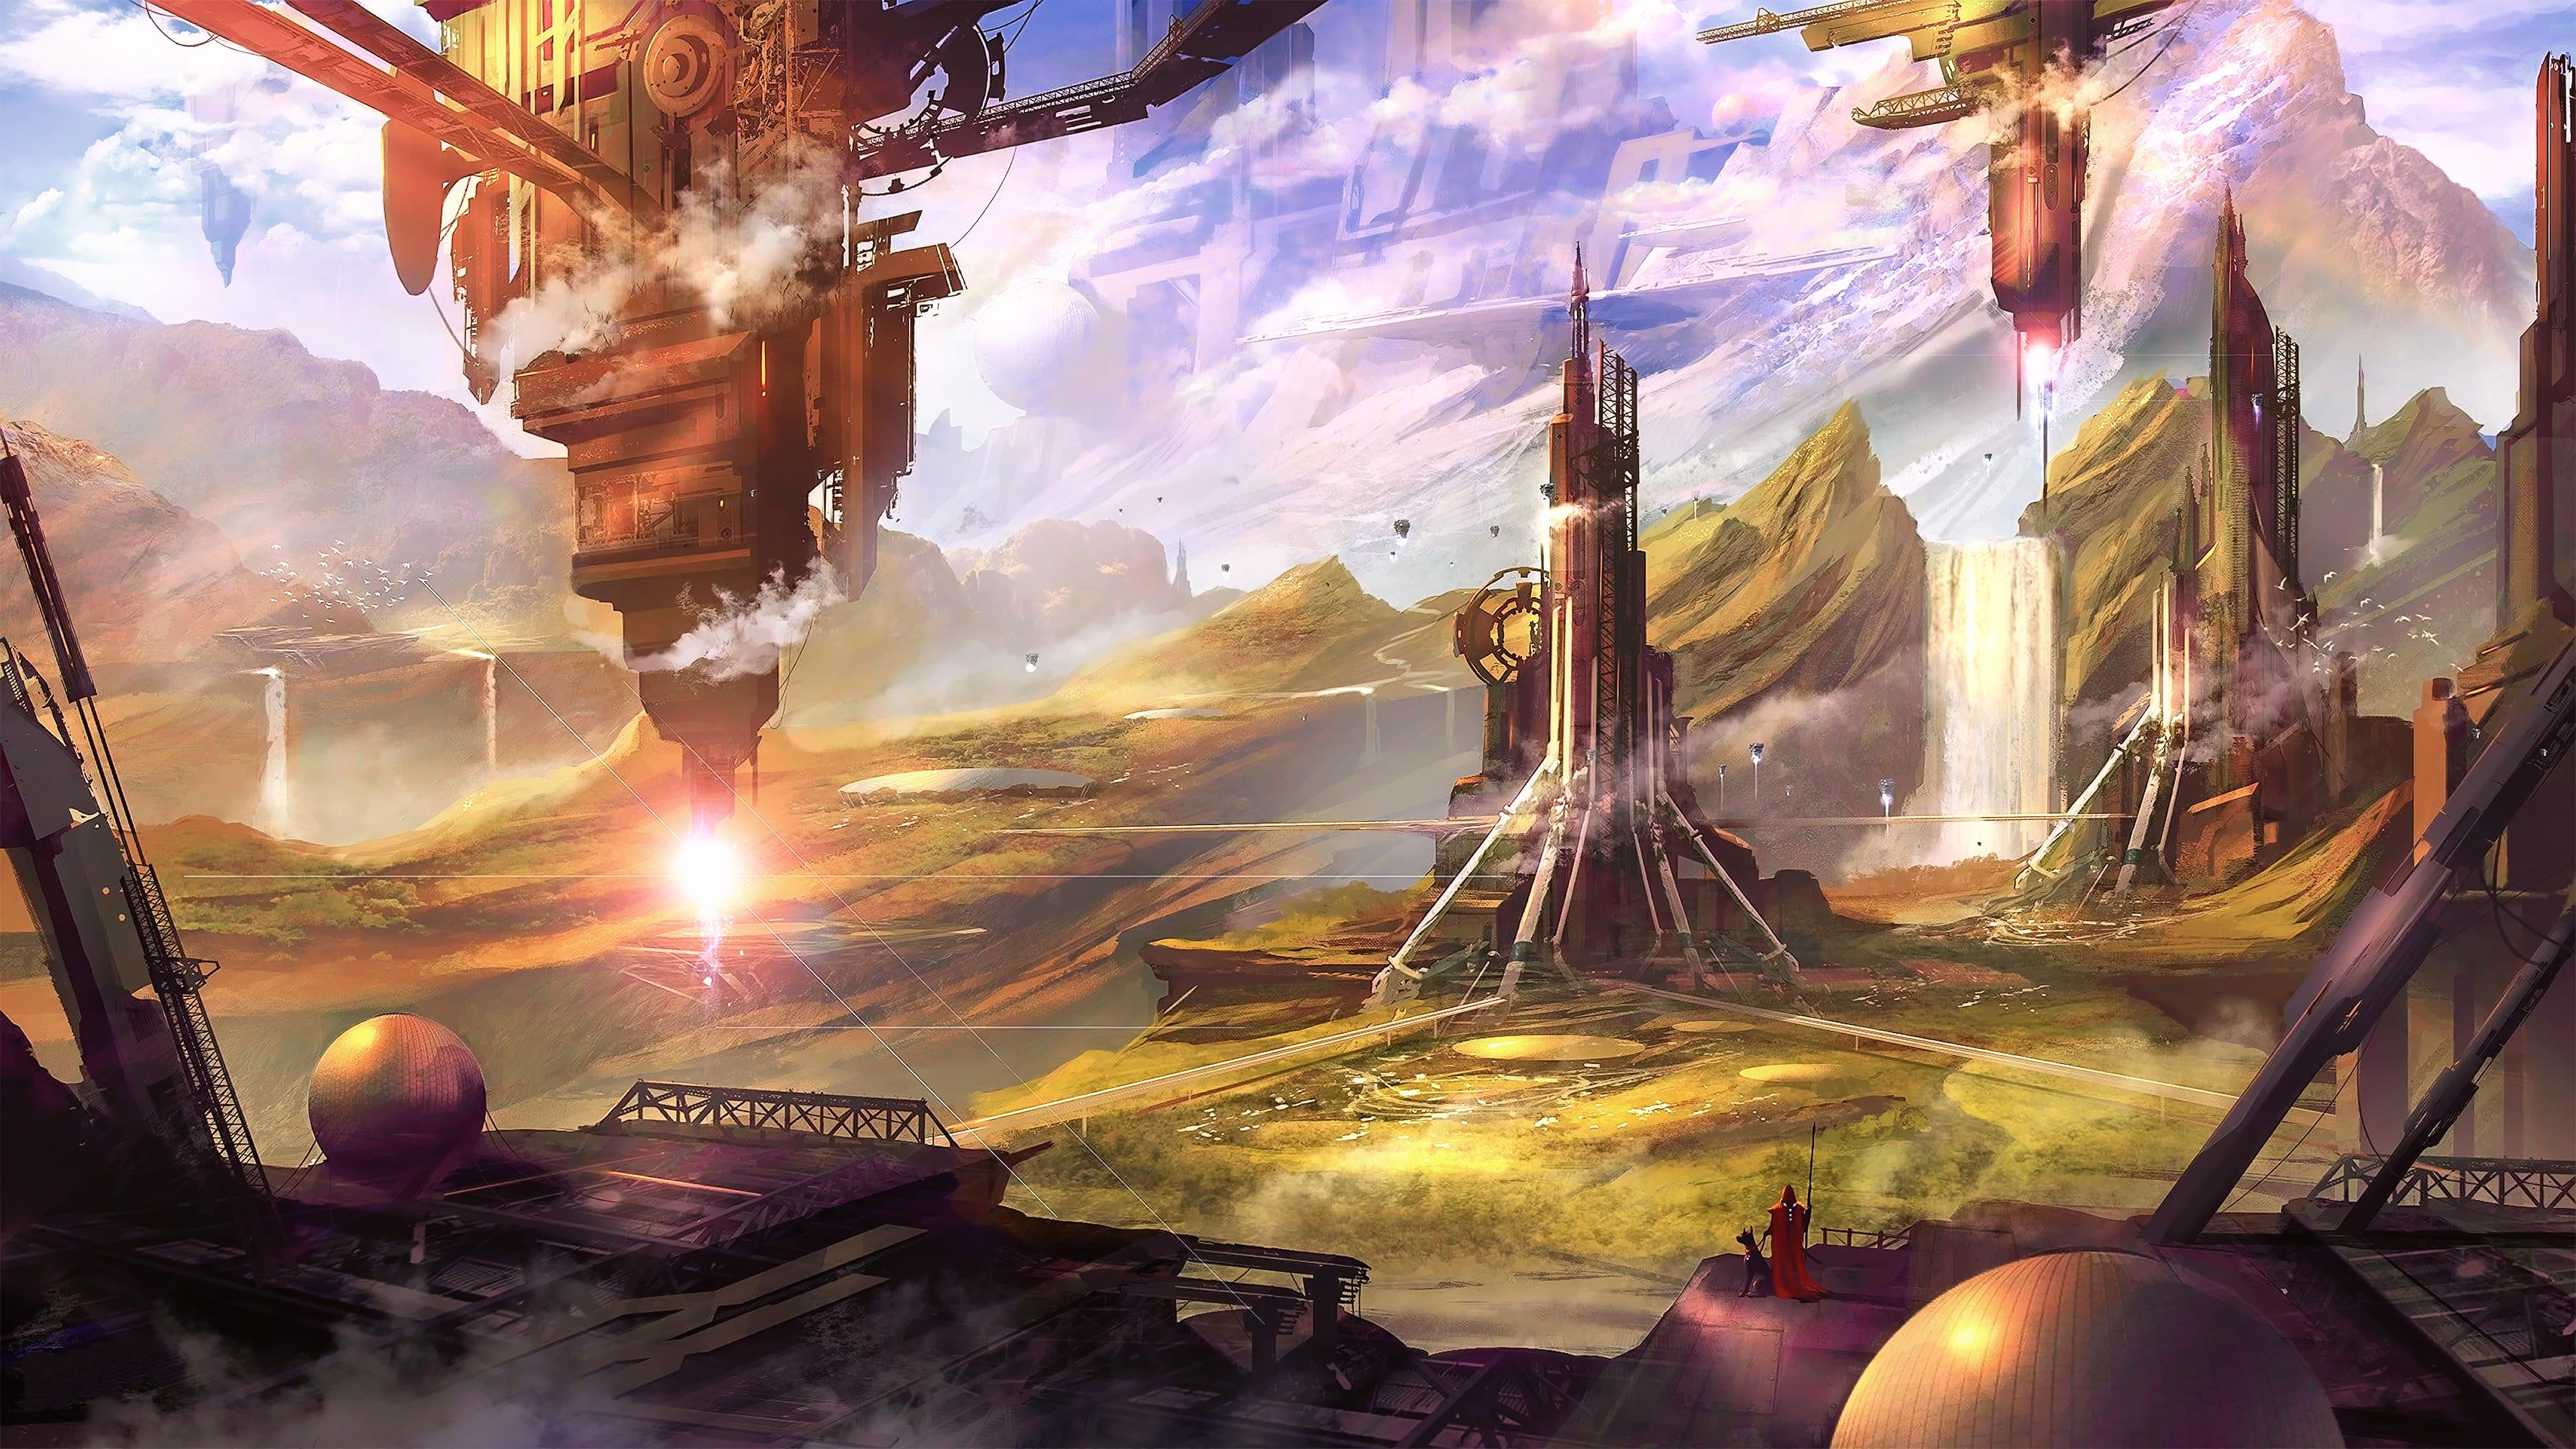 General 3840x2160 science fiction digital art concept art artwork futuristic fantasy art fan art 3D CGI cyberpunk cyber cityscape